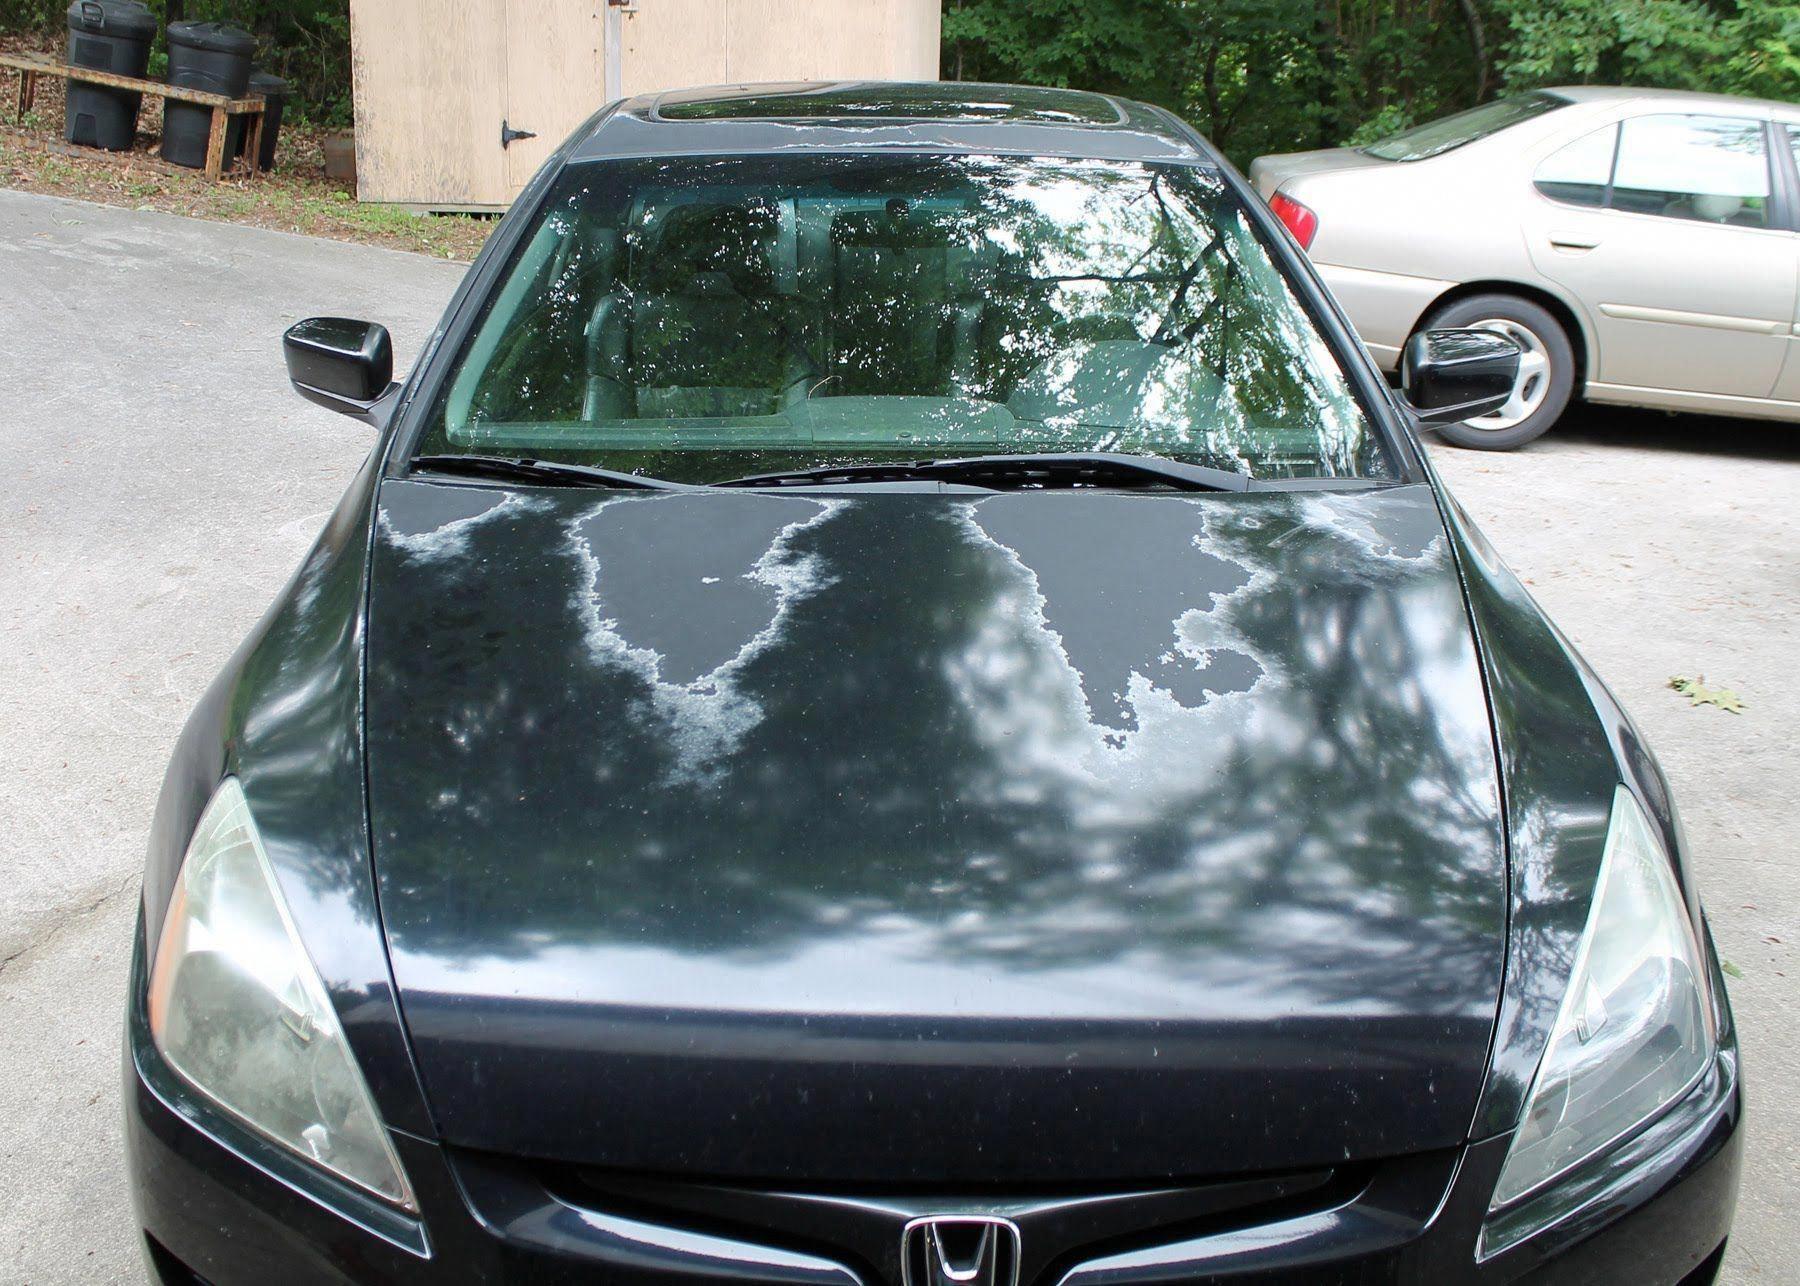 How to fix peeling Clear Coat on a vehicle | Car paint repair, Car, Car  hacks